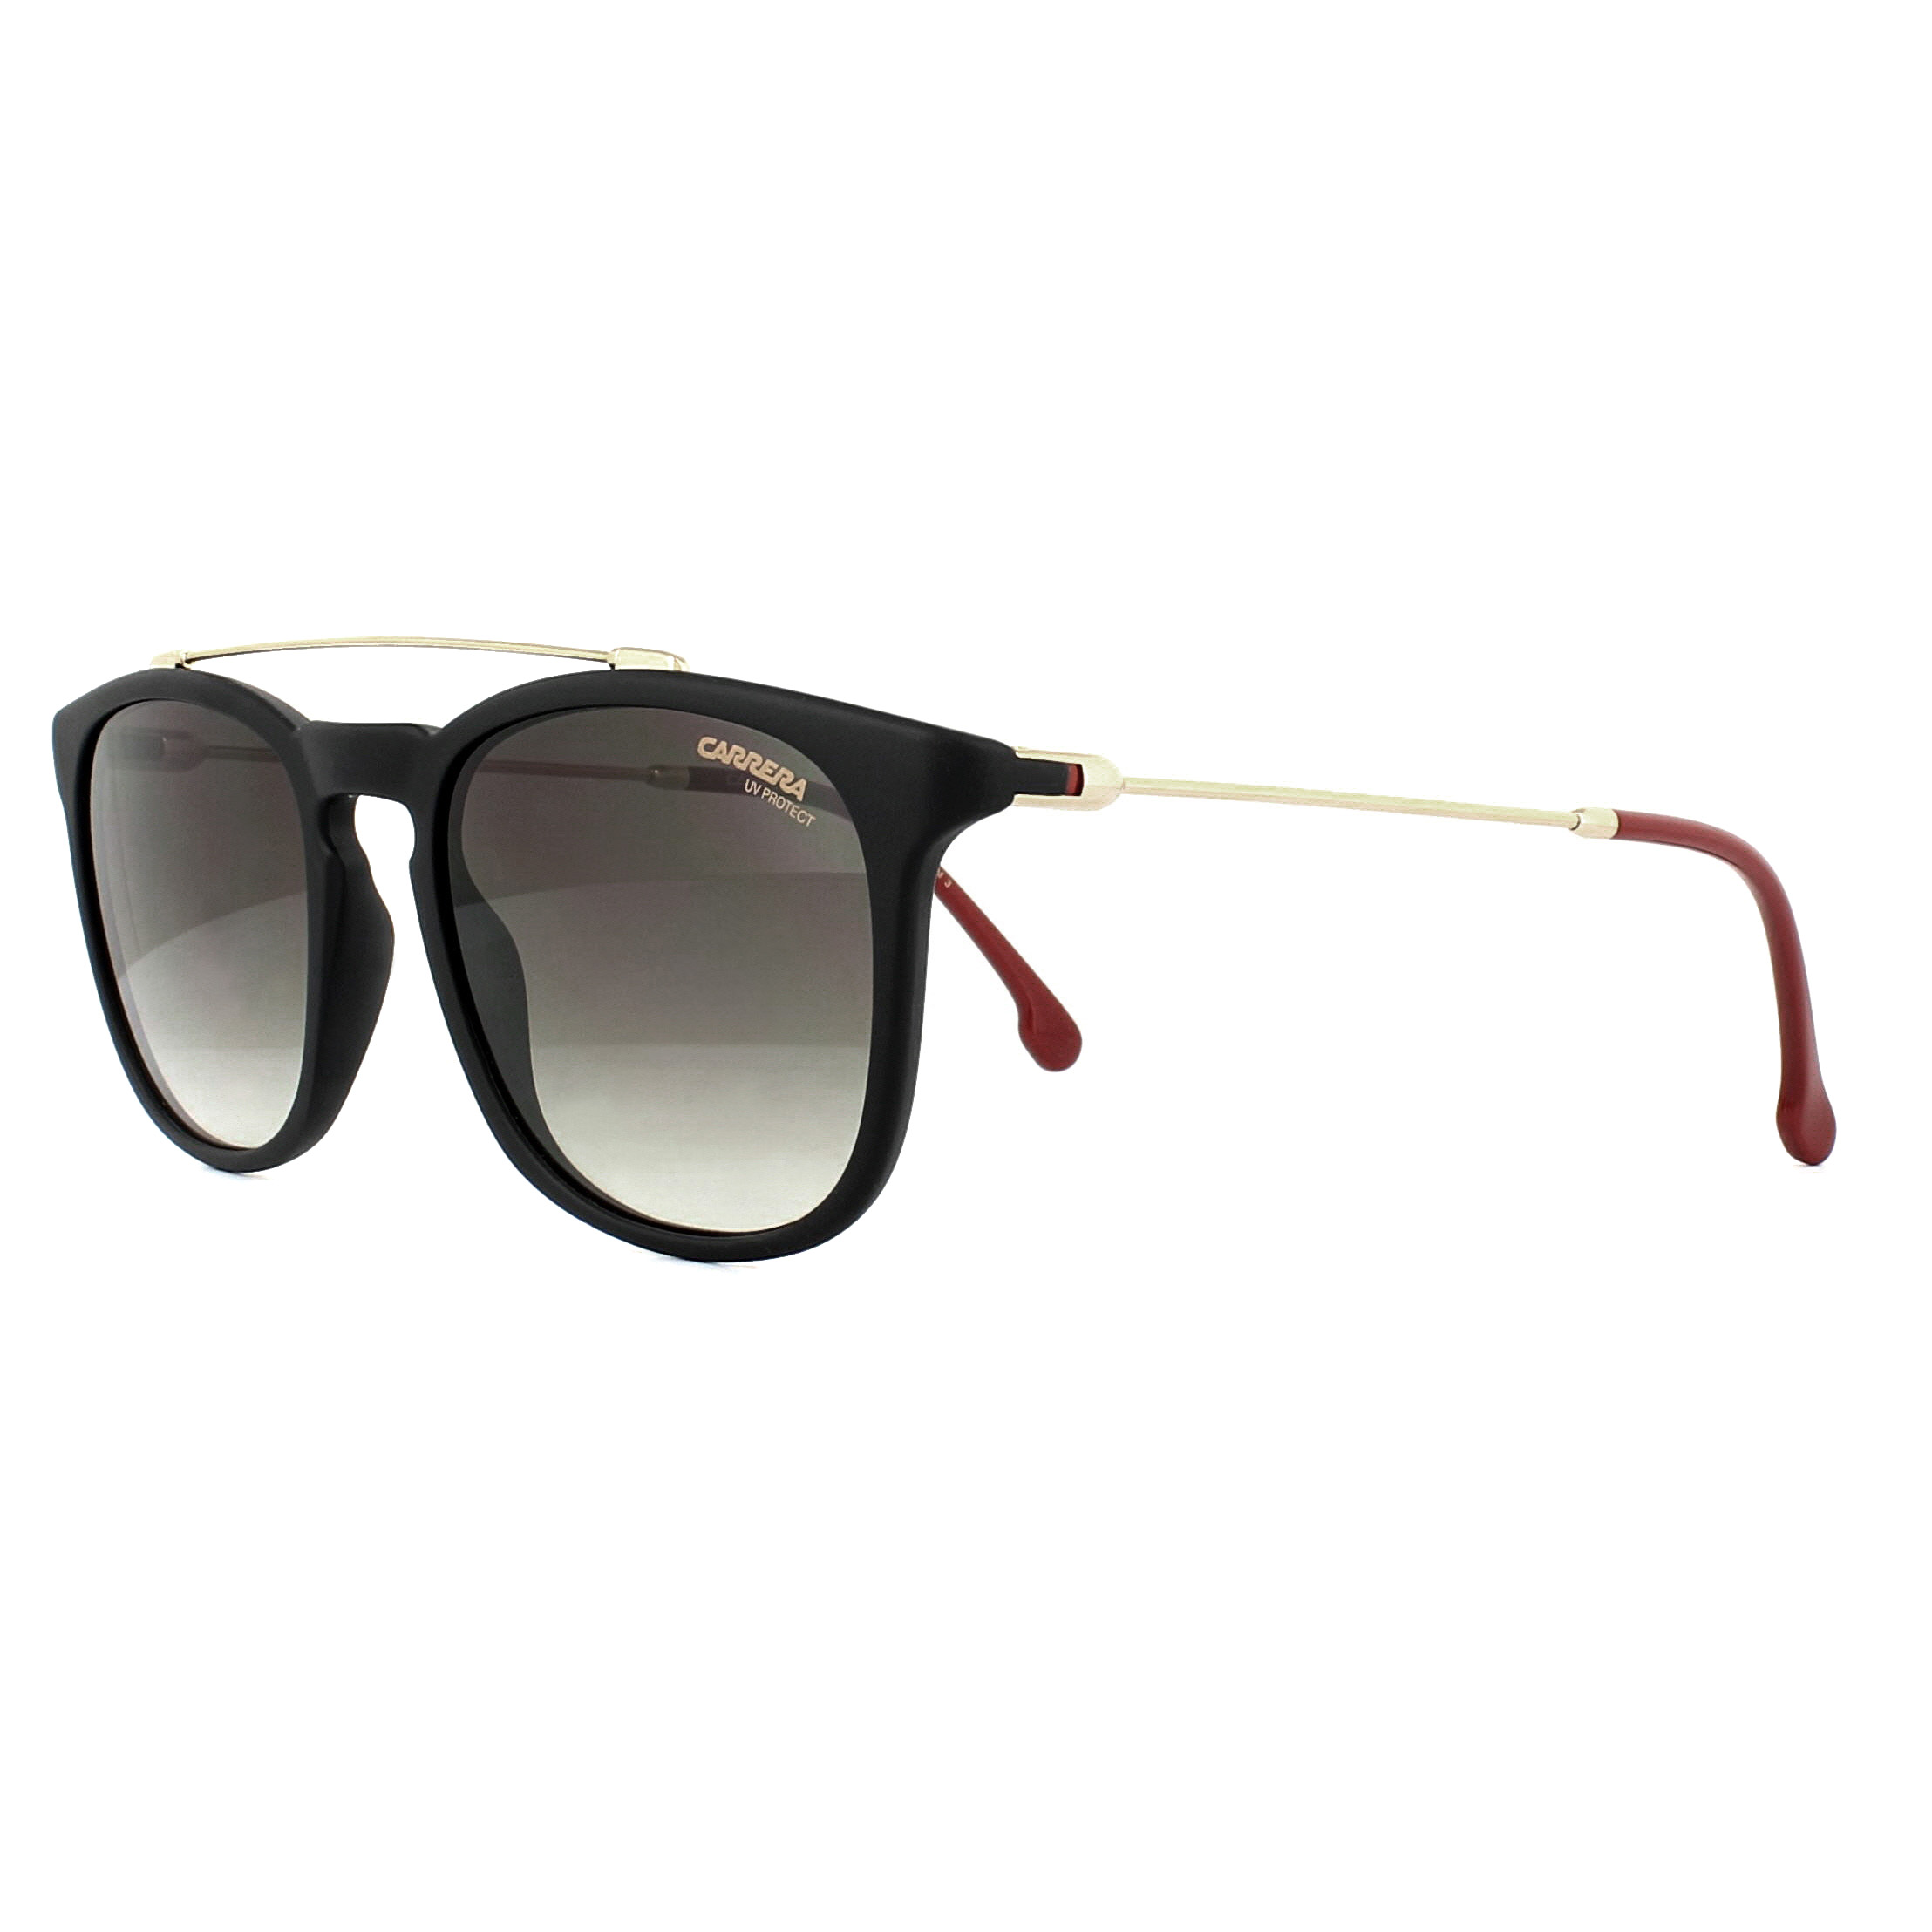 168021ddd94bd Carrera Sunglasses 154 S 003 HA Black Brown Gradient 716736031989